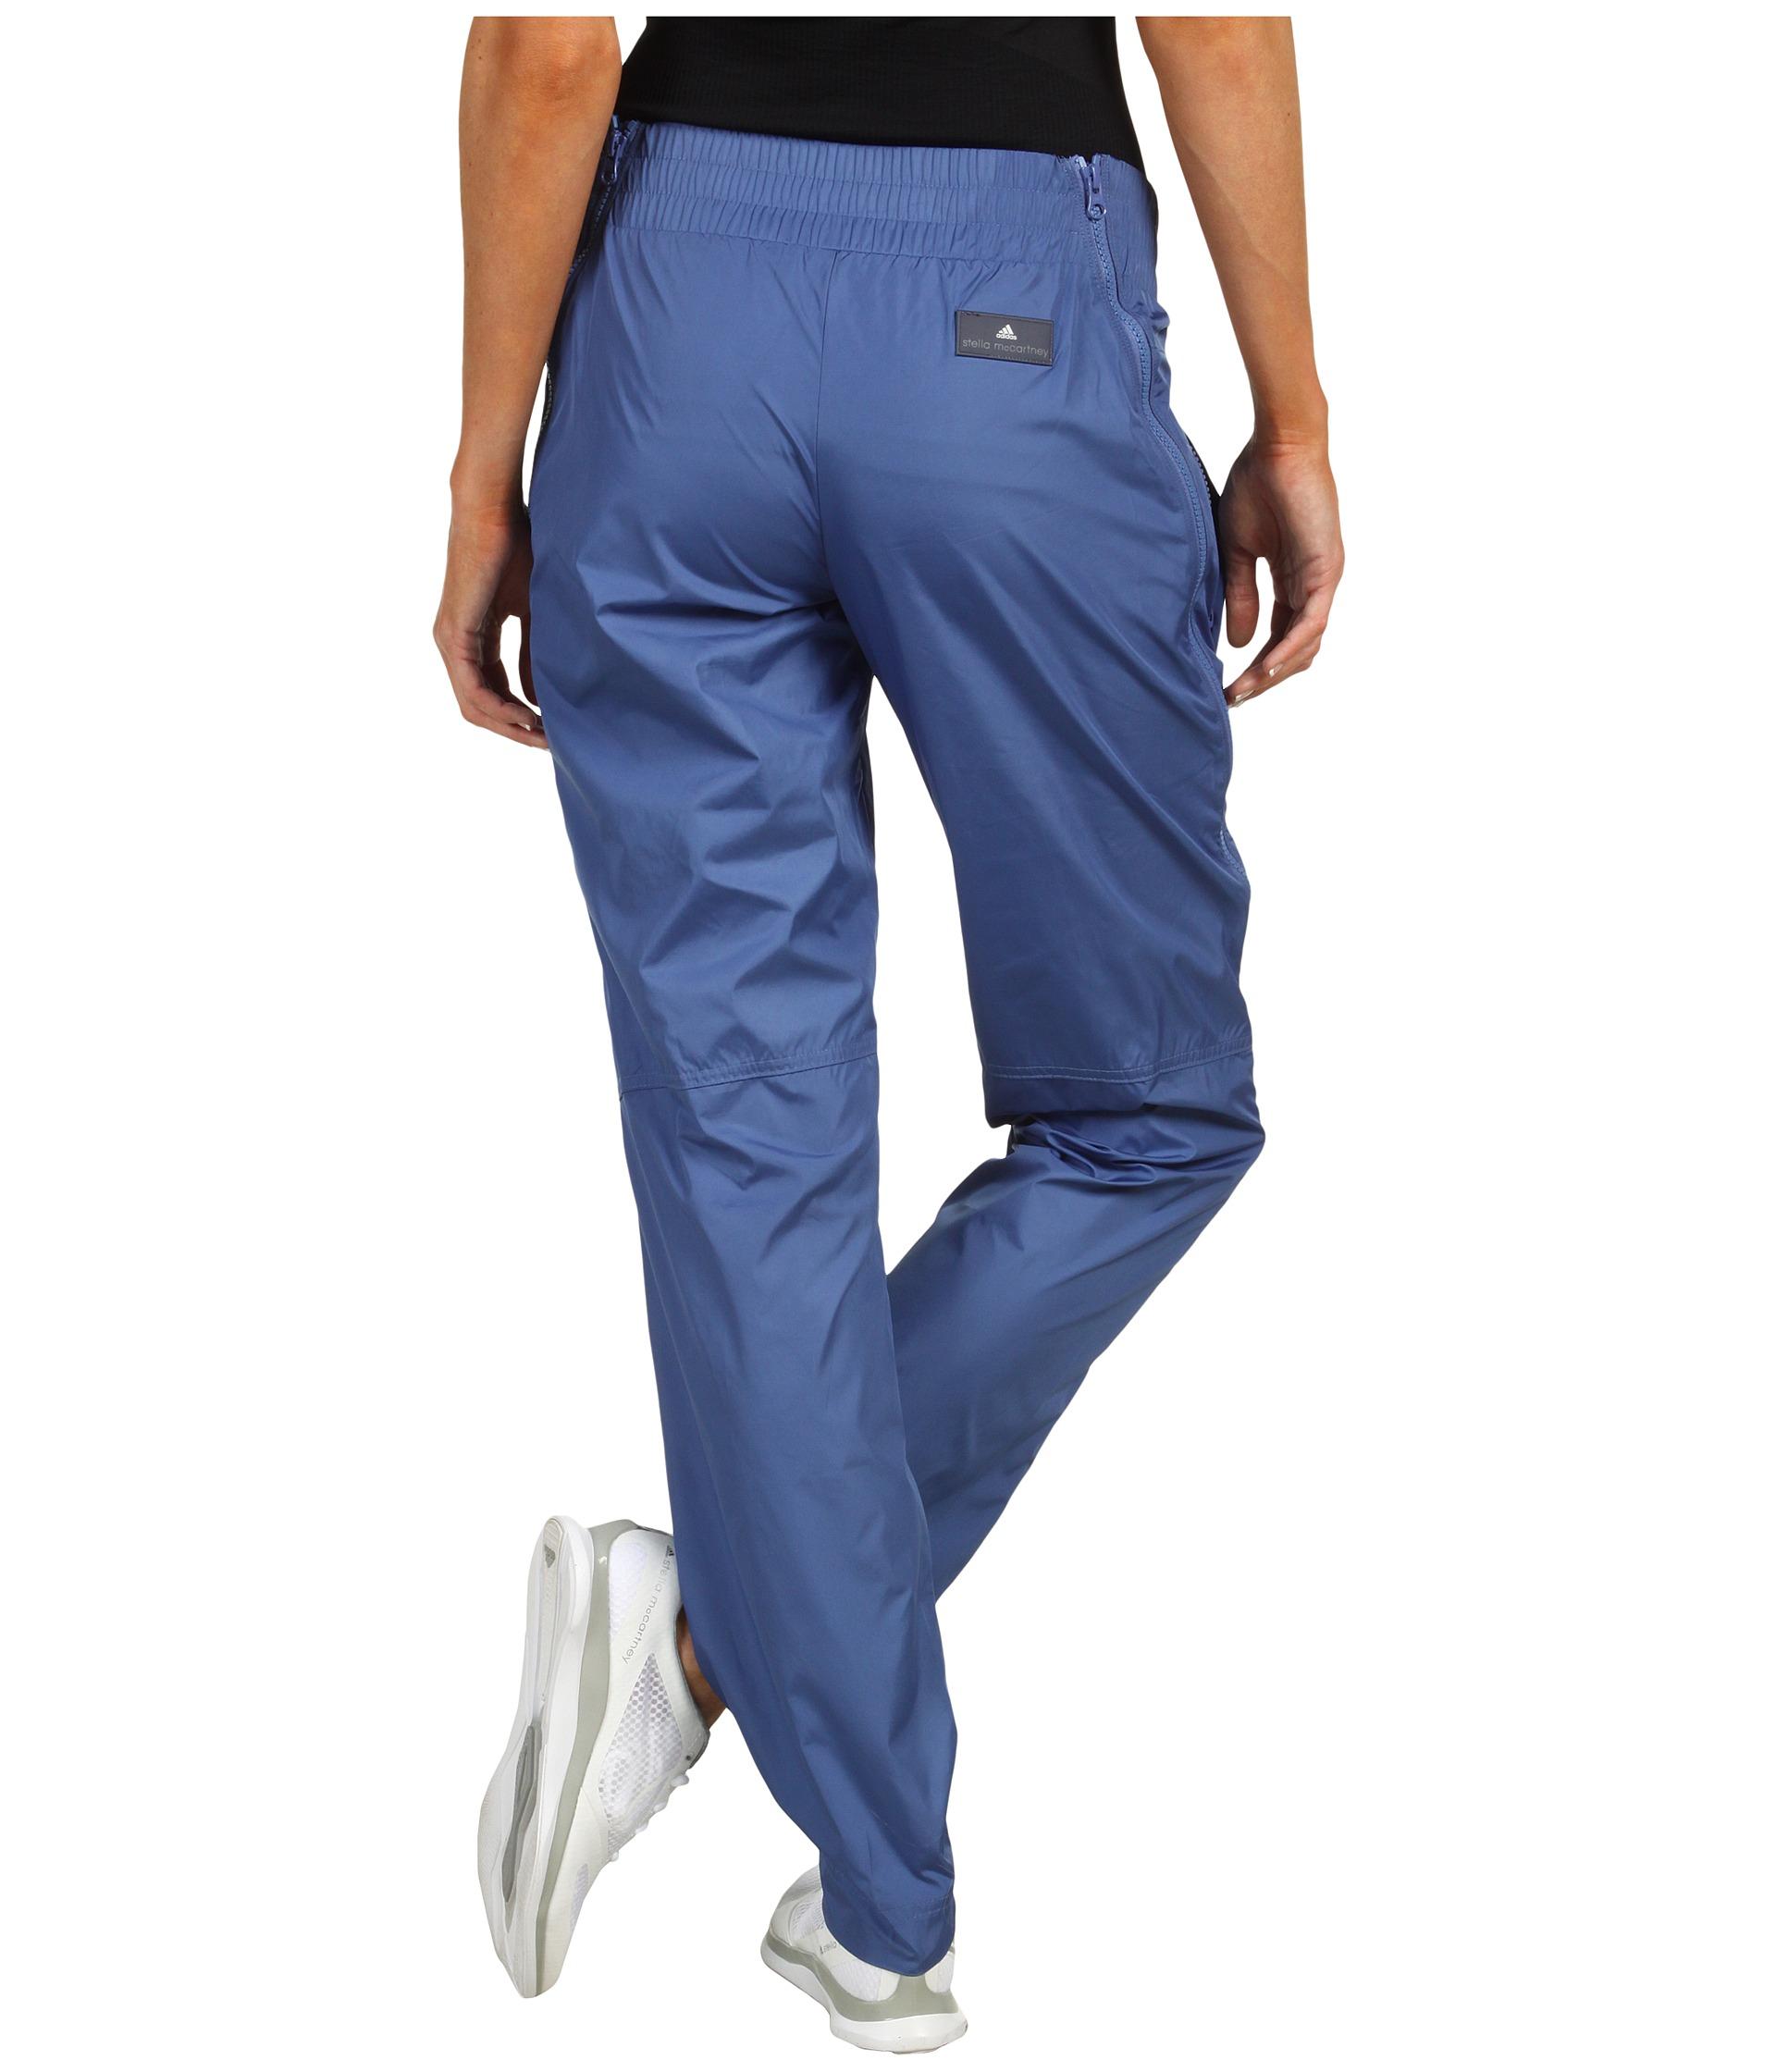 Adidas Stella McCartney Studio Woven Pants in Baby Blue Rear View